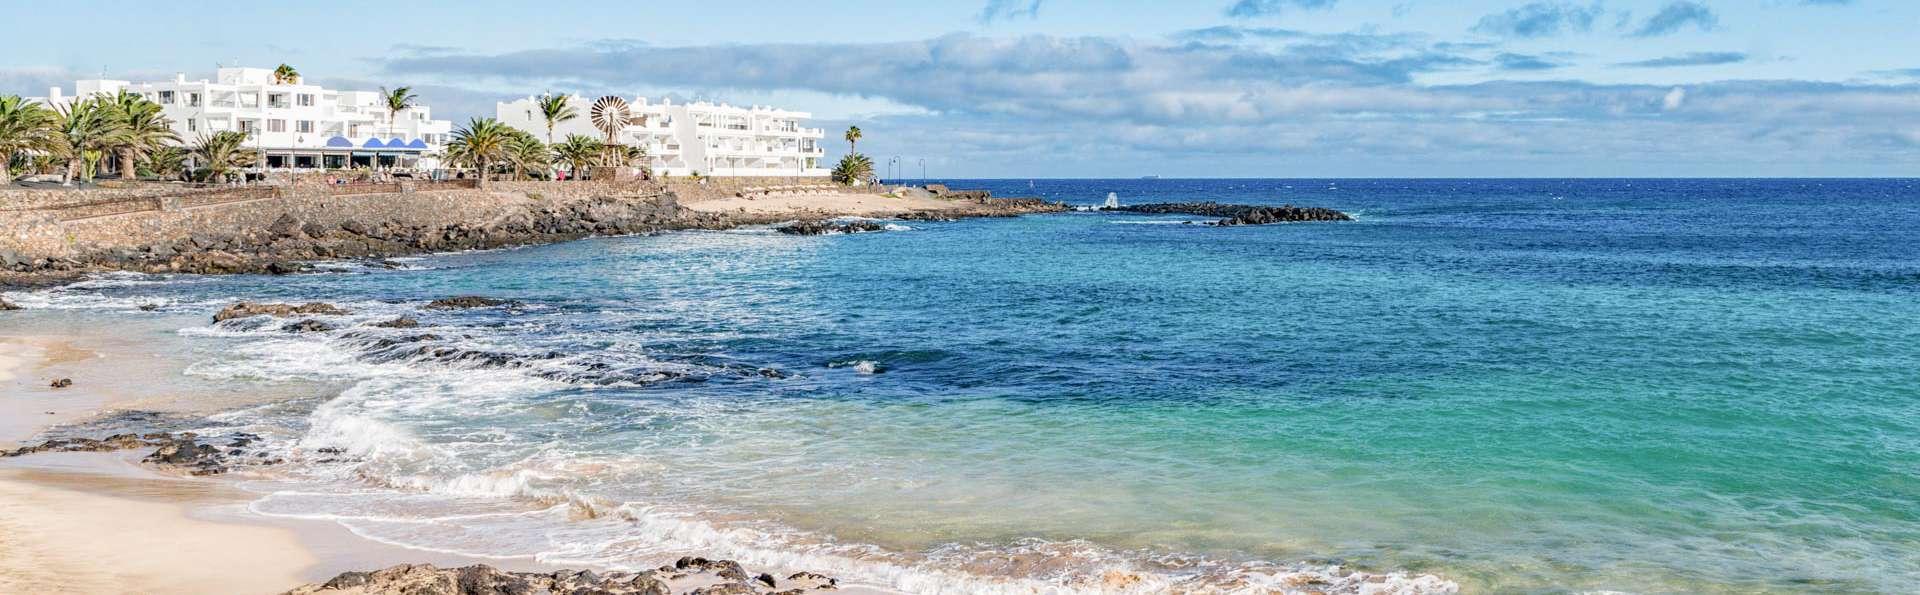 Blue Sea Costa Teguise Gardens - EDIT_DESTINATION_01.jpg